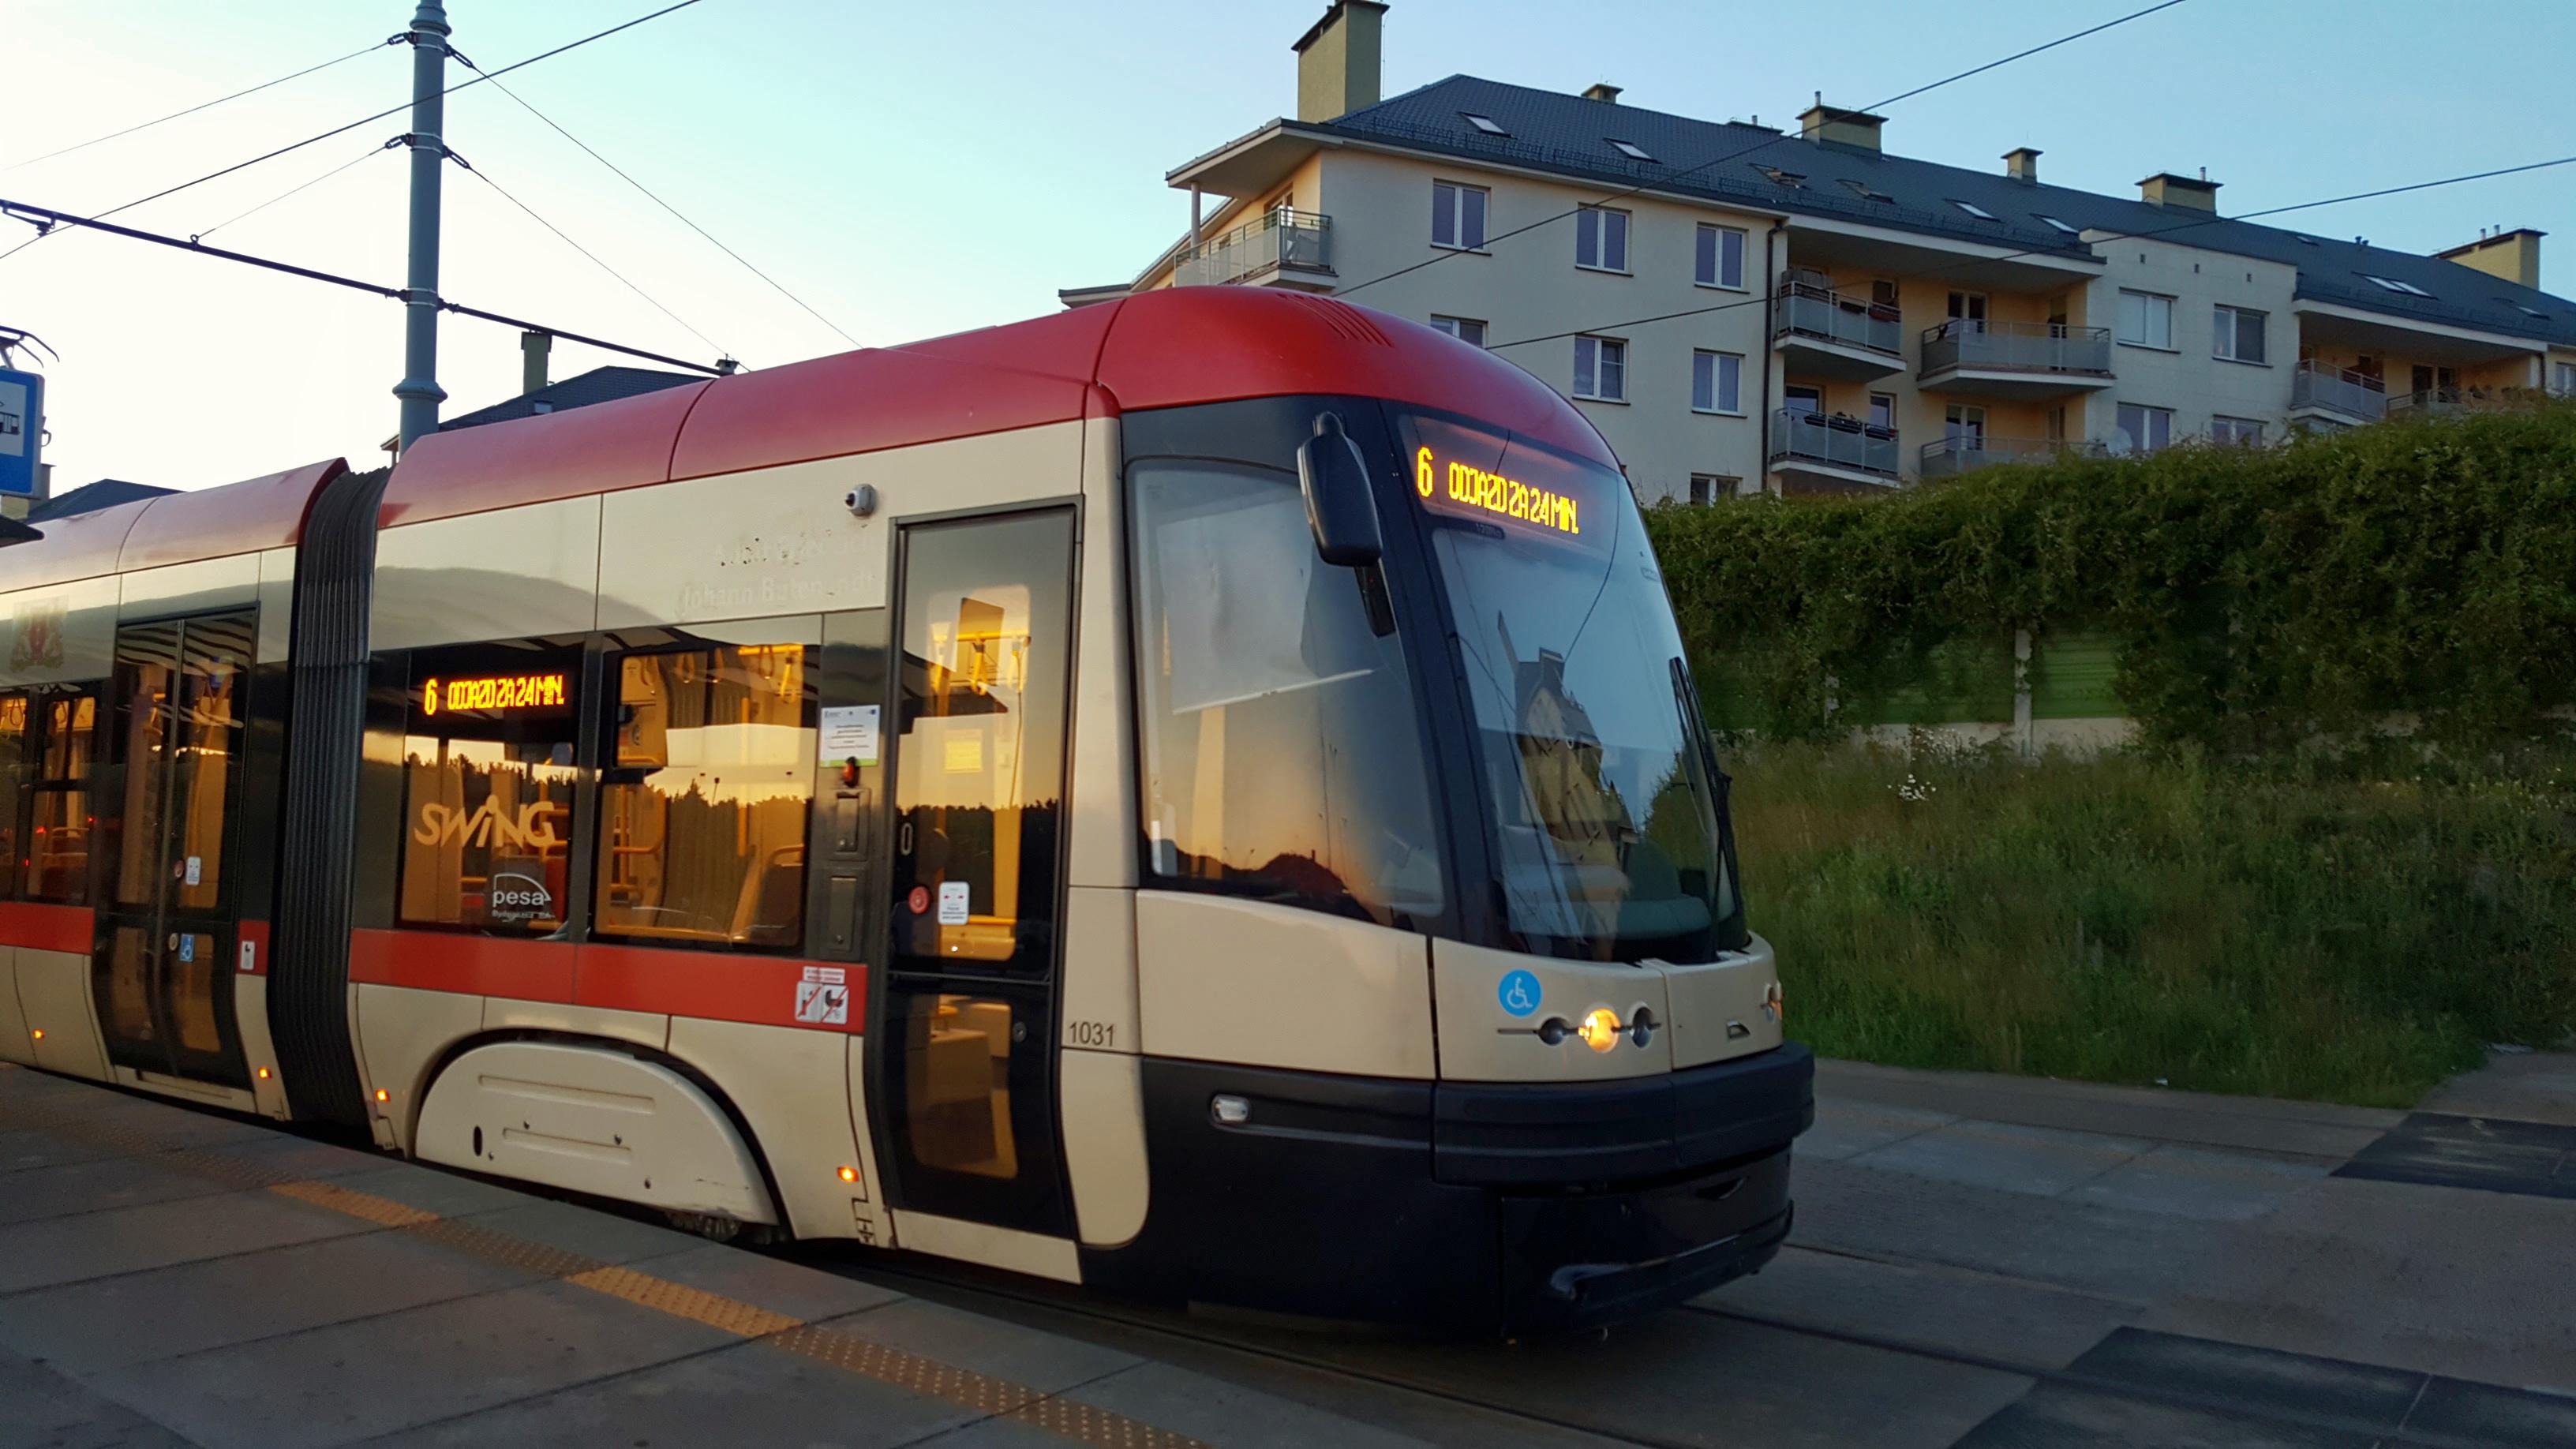 Unikalne Public transport in Gdansk and Tricity - Explore Gdansk DR01